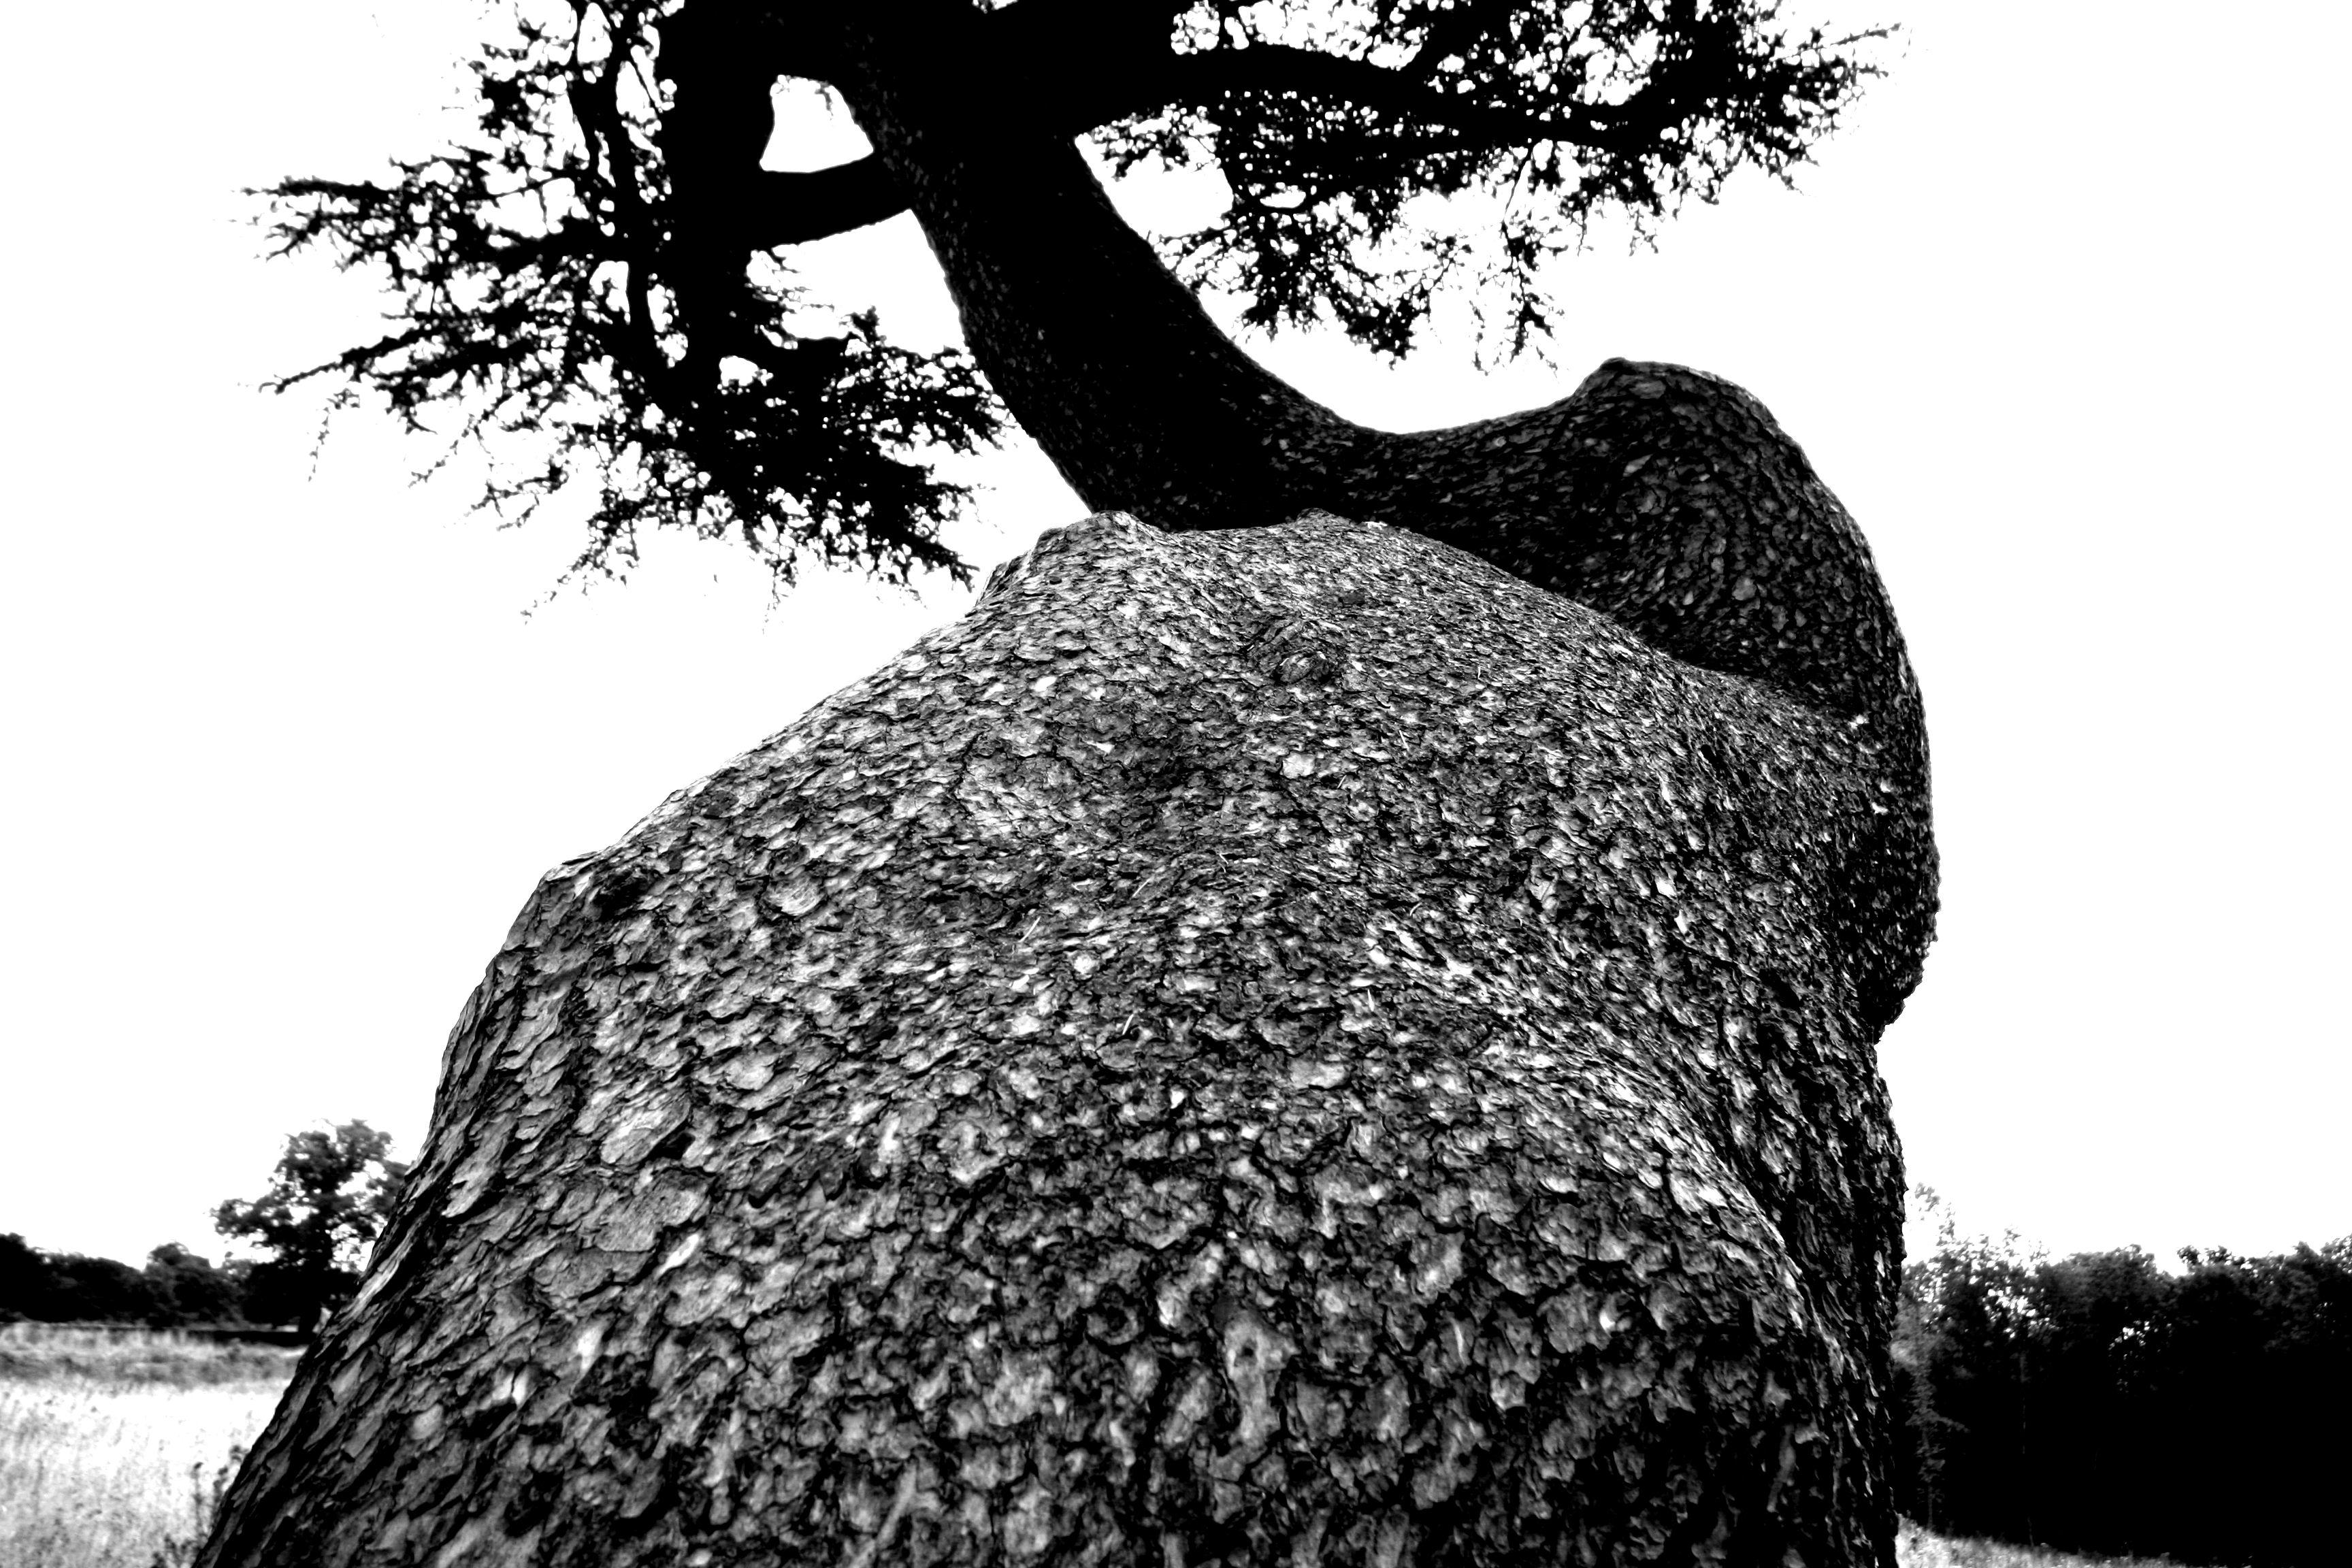 Tree - big